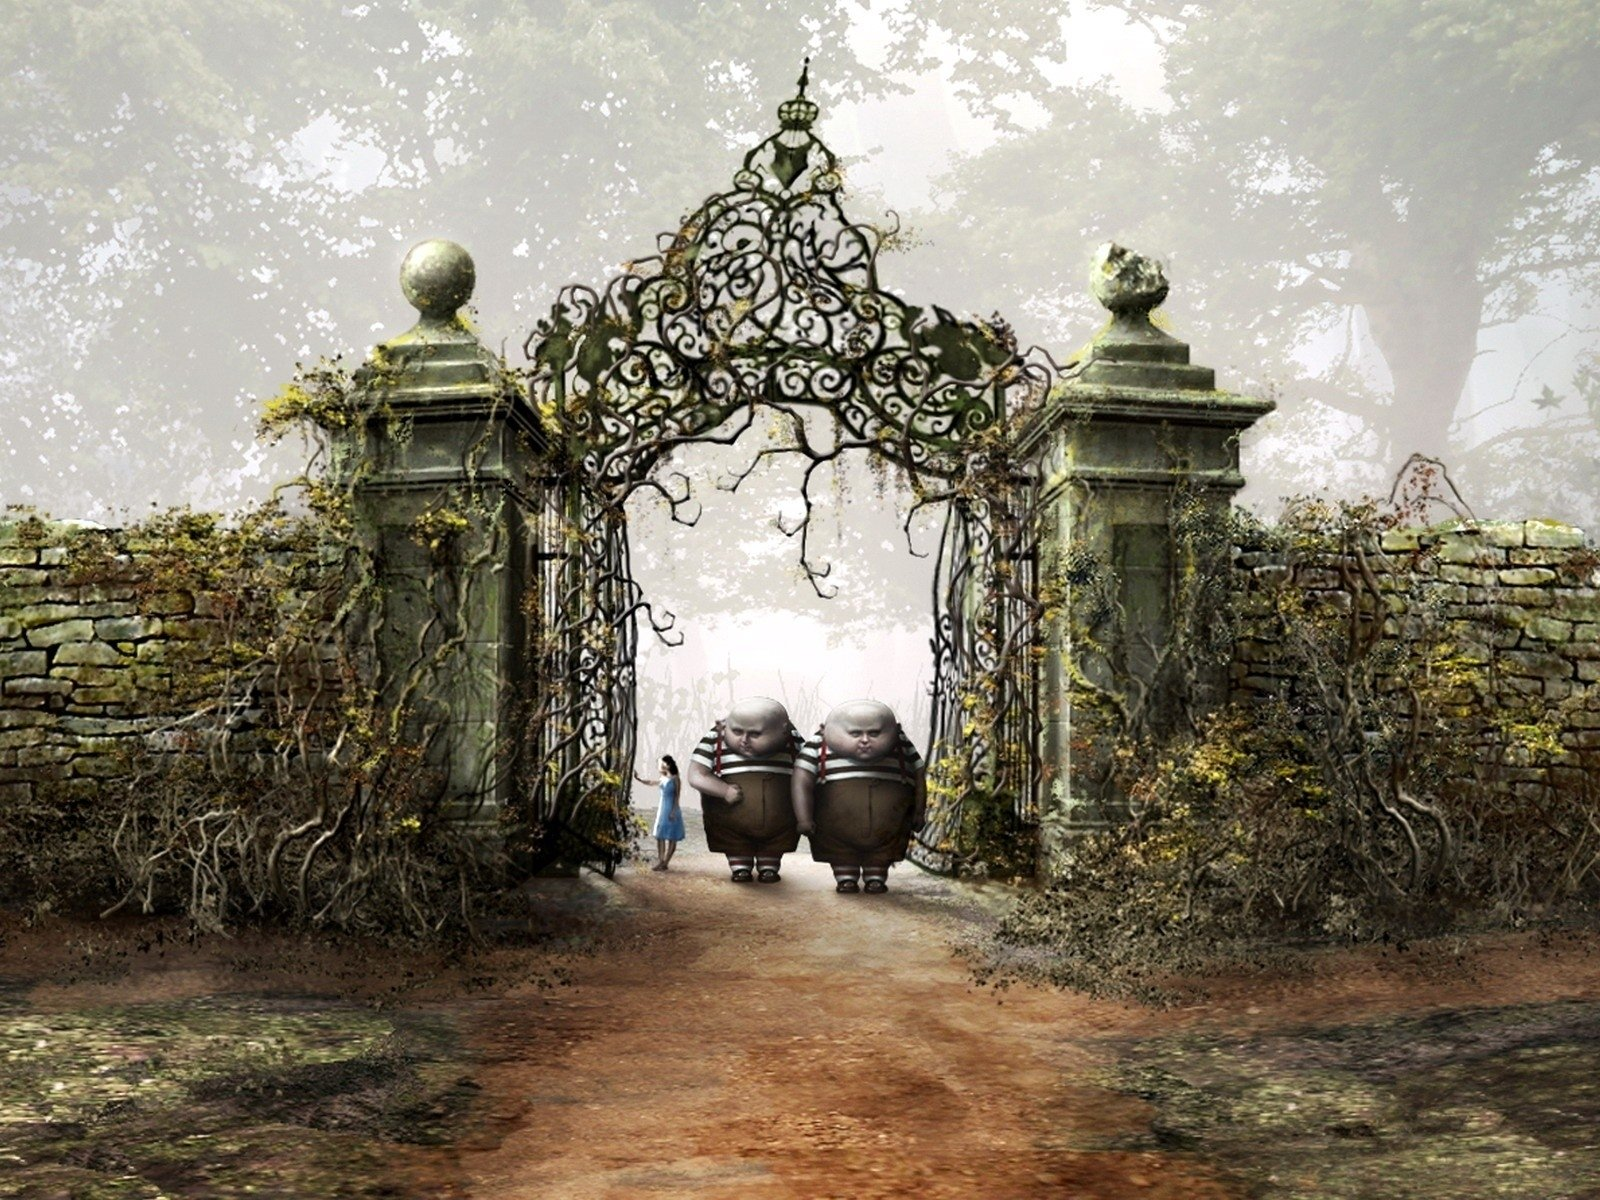 Tim Burtons Alice In Wonderland Fondo De Pantalla And Fondo